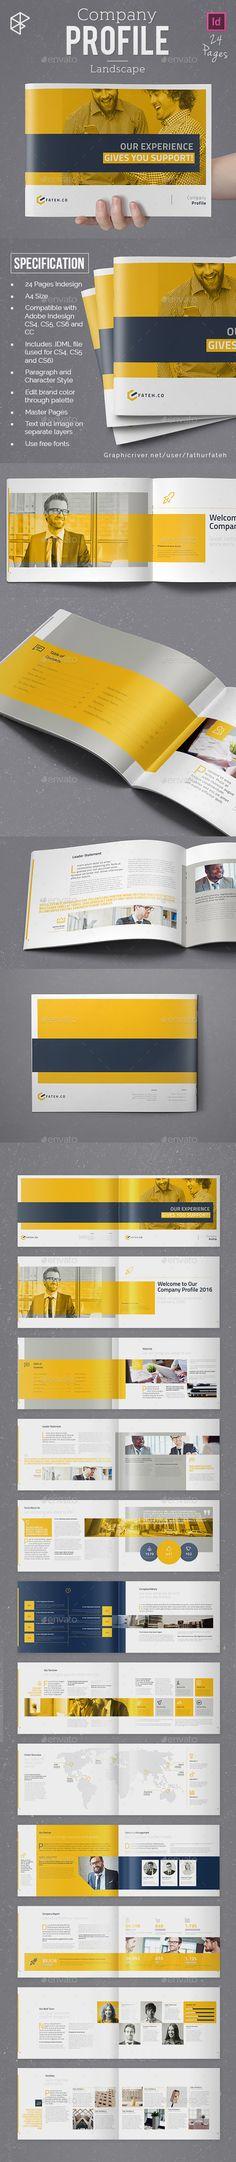 Company Profile Design Template Landscape - Corporate Brochure Template InDesign INDD. Download here: https://graphicriver.net/item/company-profile-landscape/17680976?ref=yinkira